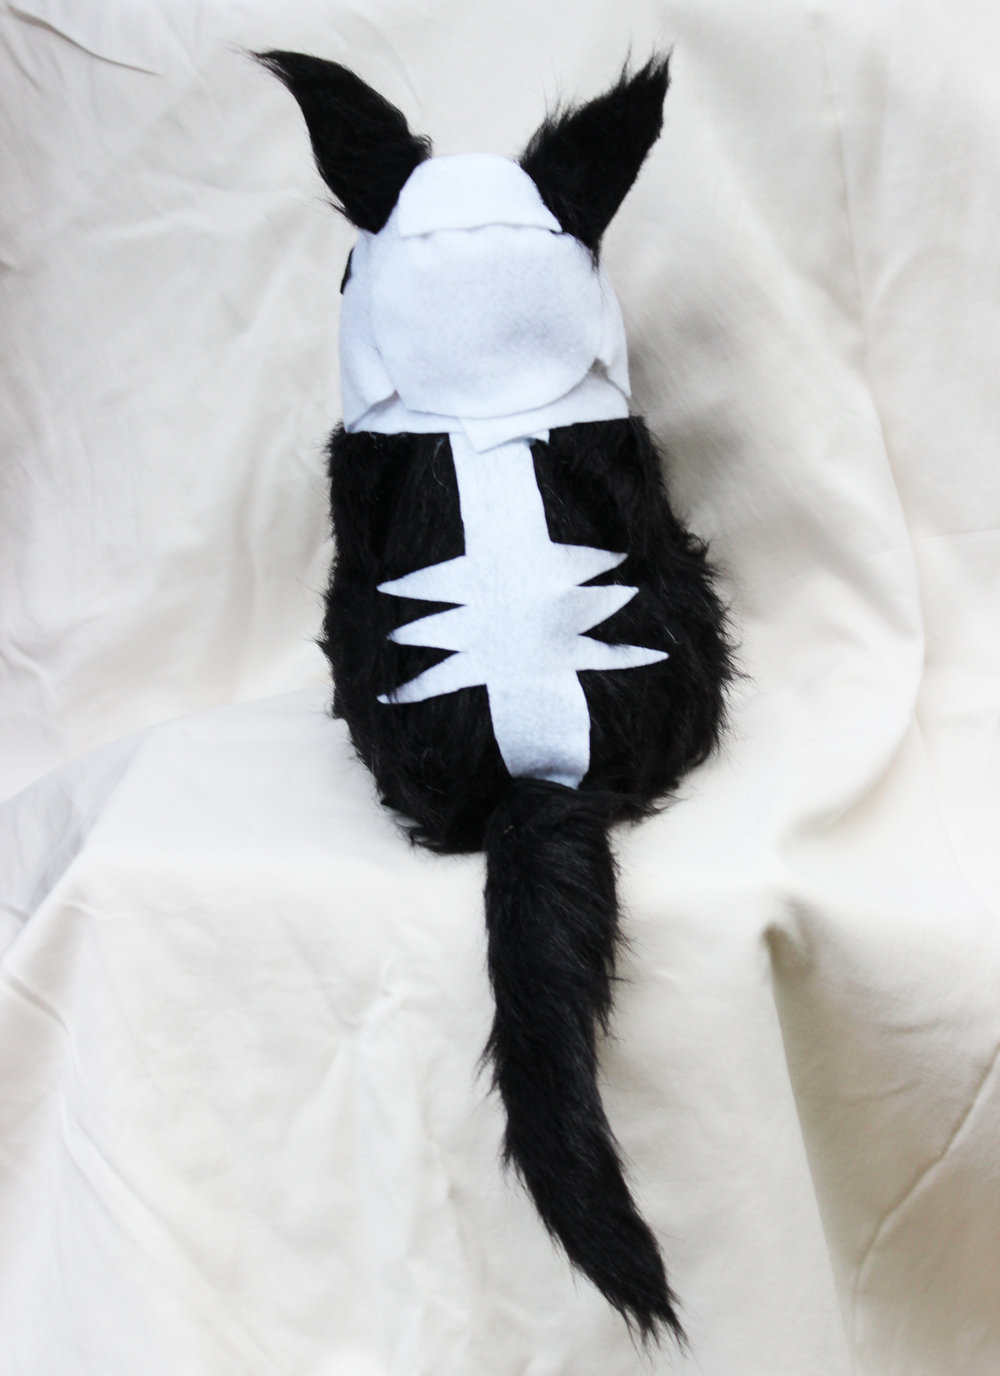 Chantal-Benitez-Frank-Puppet-Fur-Black